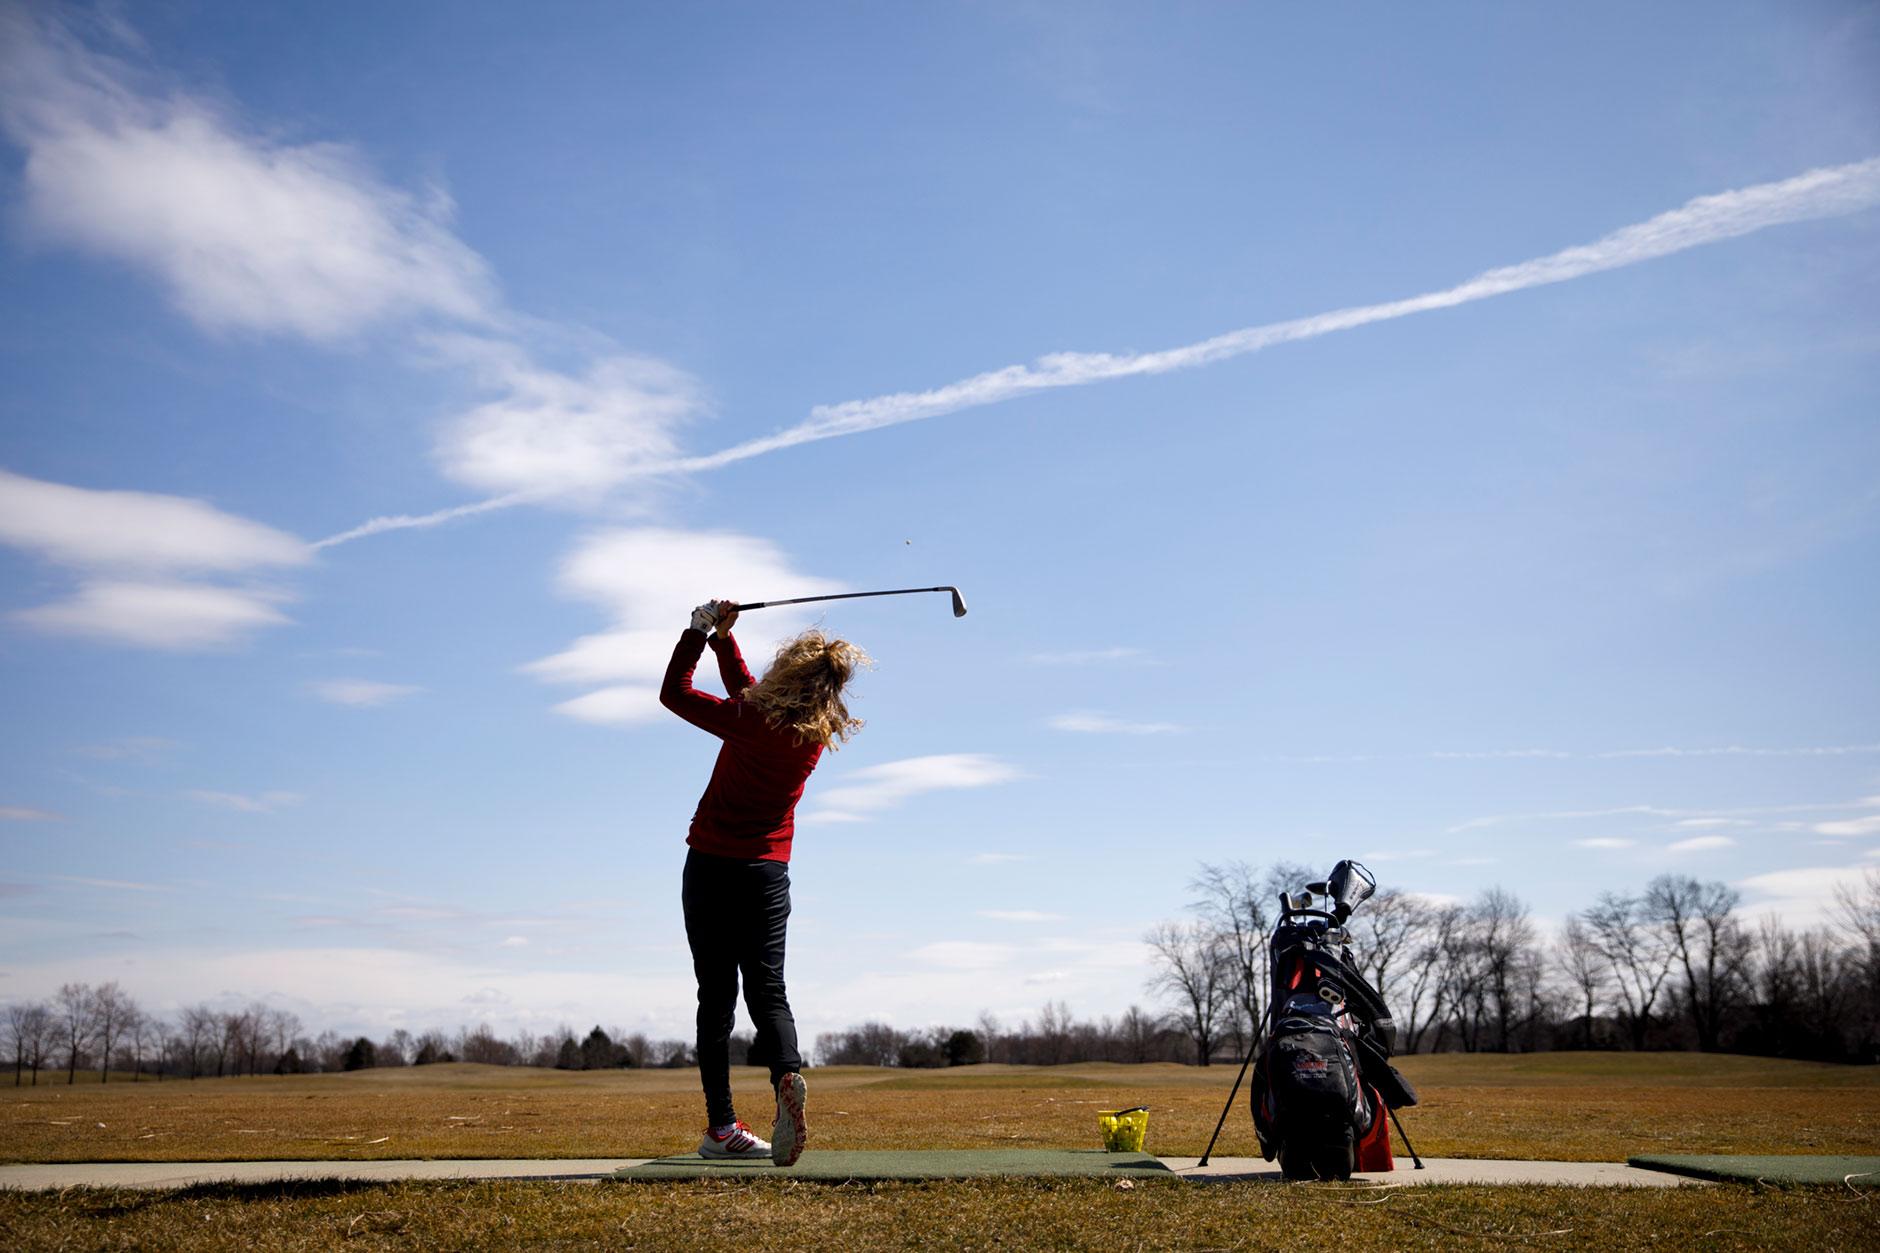 Bailey Troutman, a graduating senior at IU Kokomo, hits a golf ball on the range at Wildcat Creek Golf Course in Kokomo on Wednesday, March 21, 2018. (James Brosher/IU Communications)